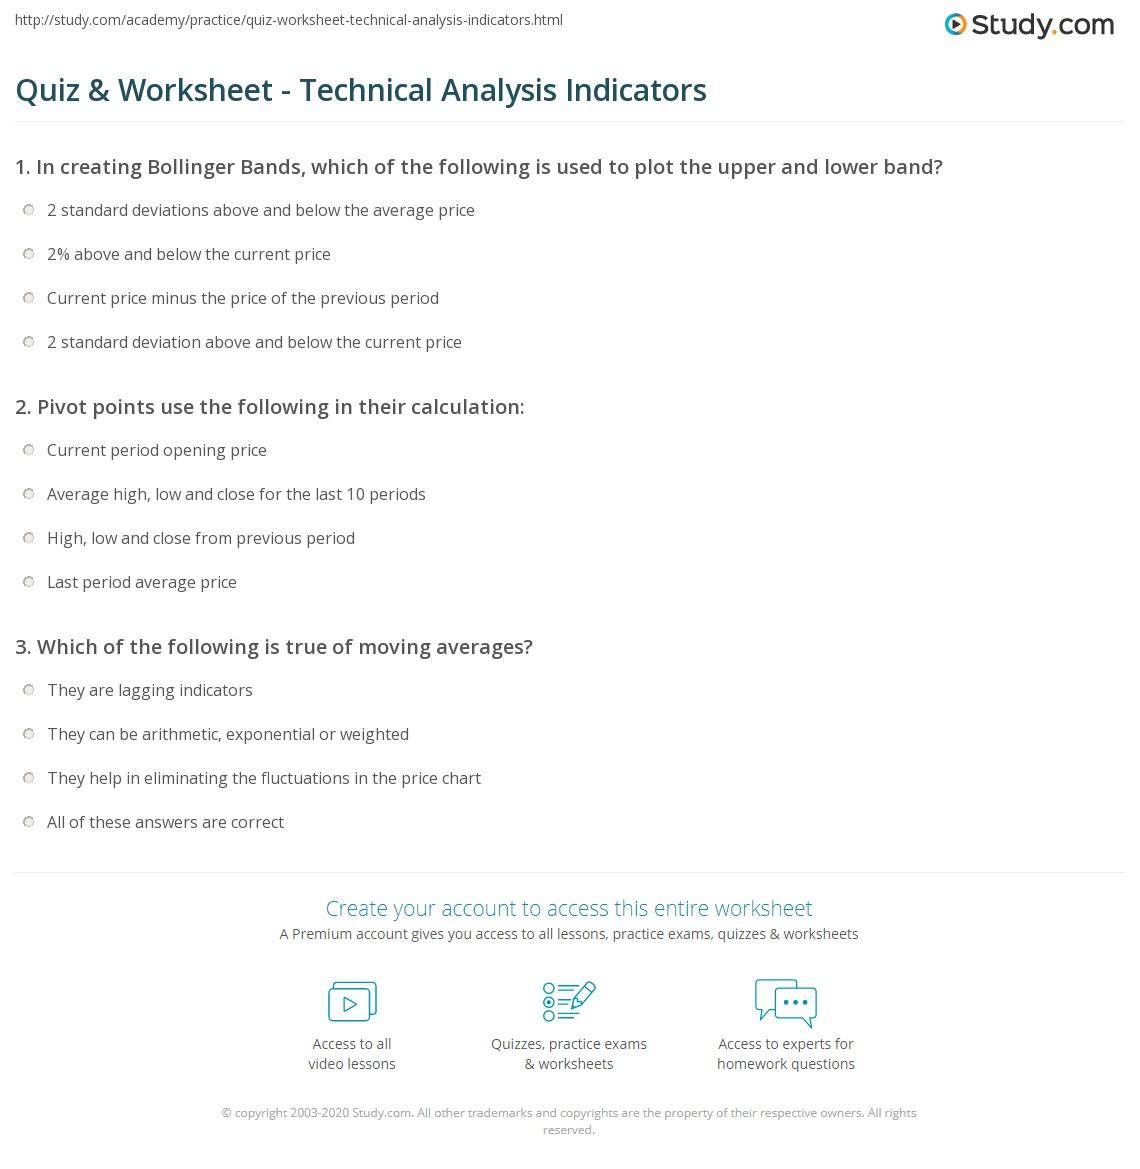 Quiz & Worksheet - Technical Analysis Indicators | Study com